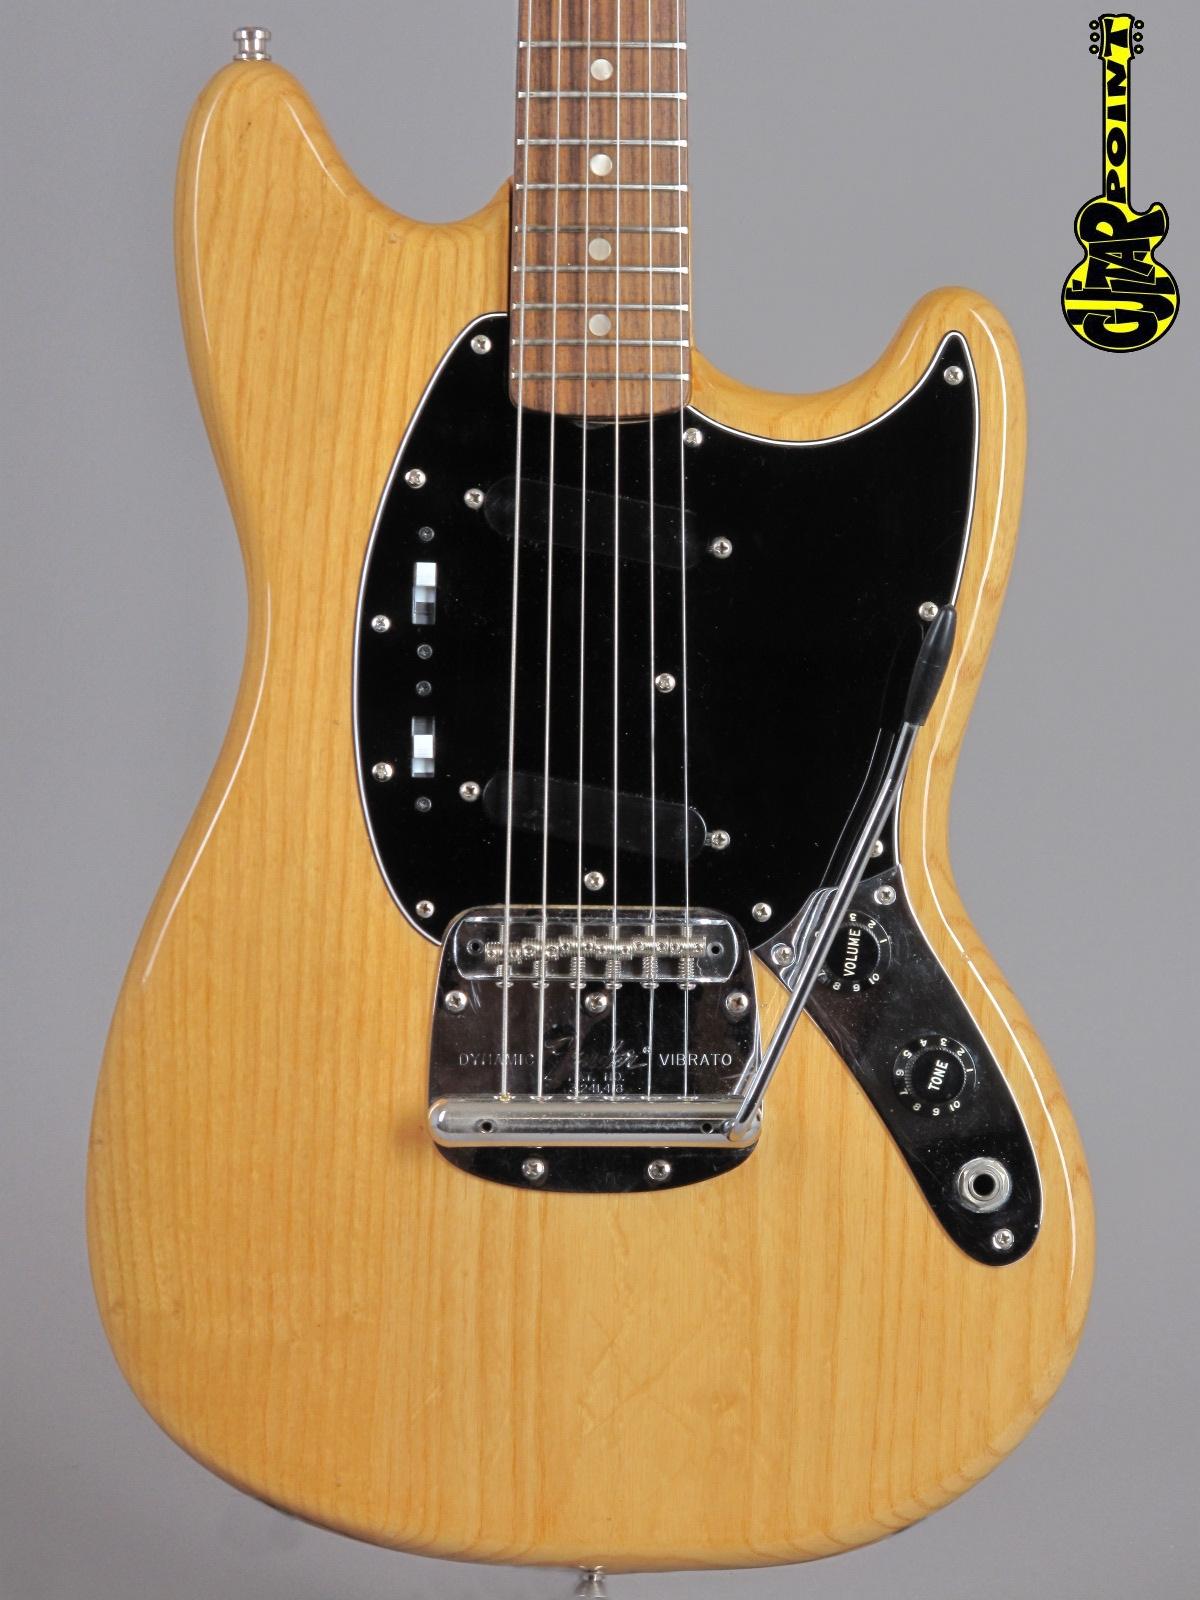 1977 Fender Mustang - Natural